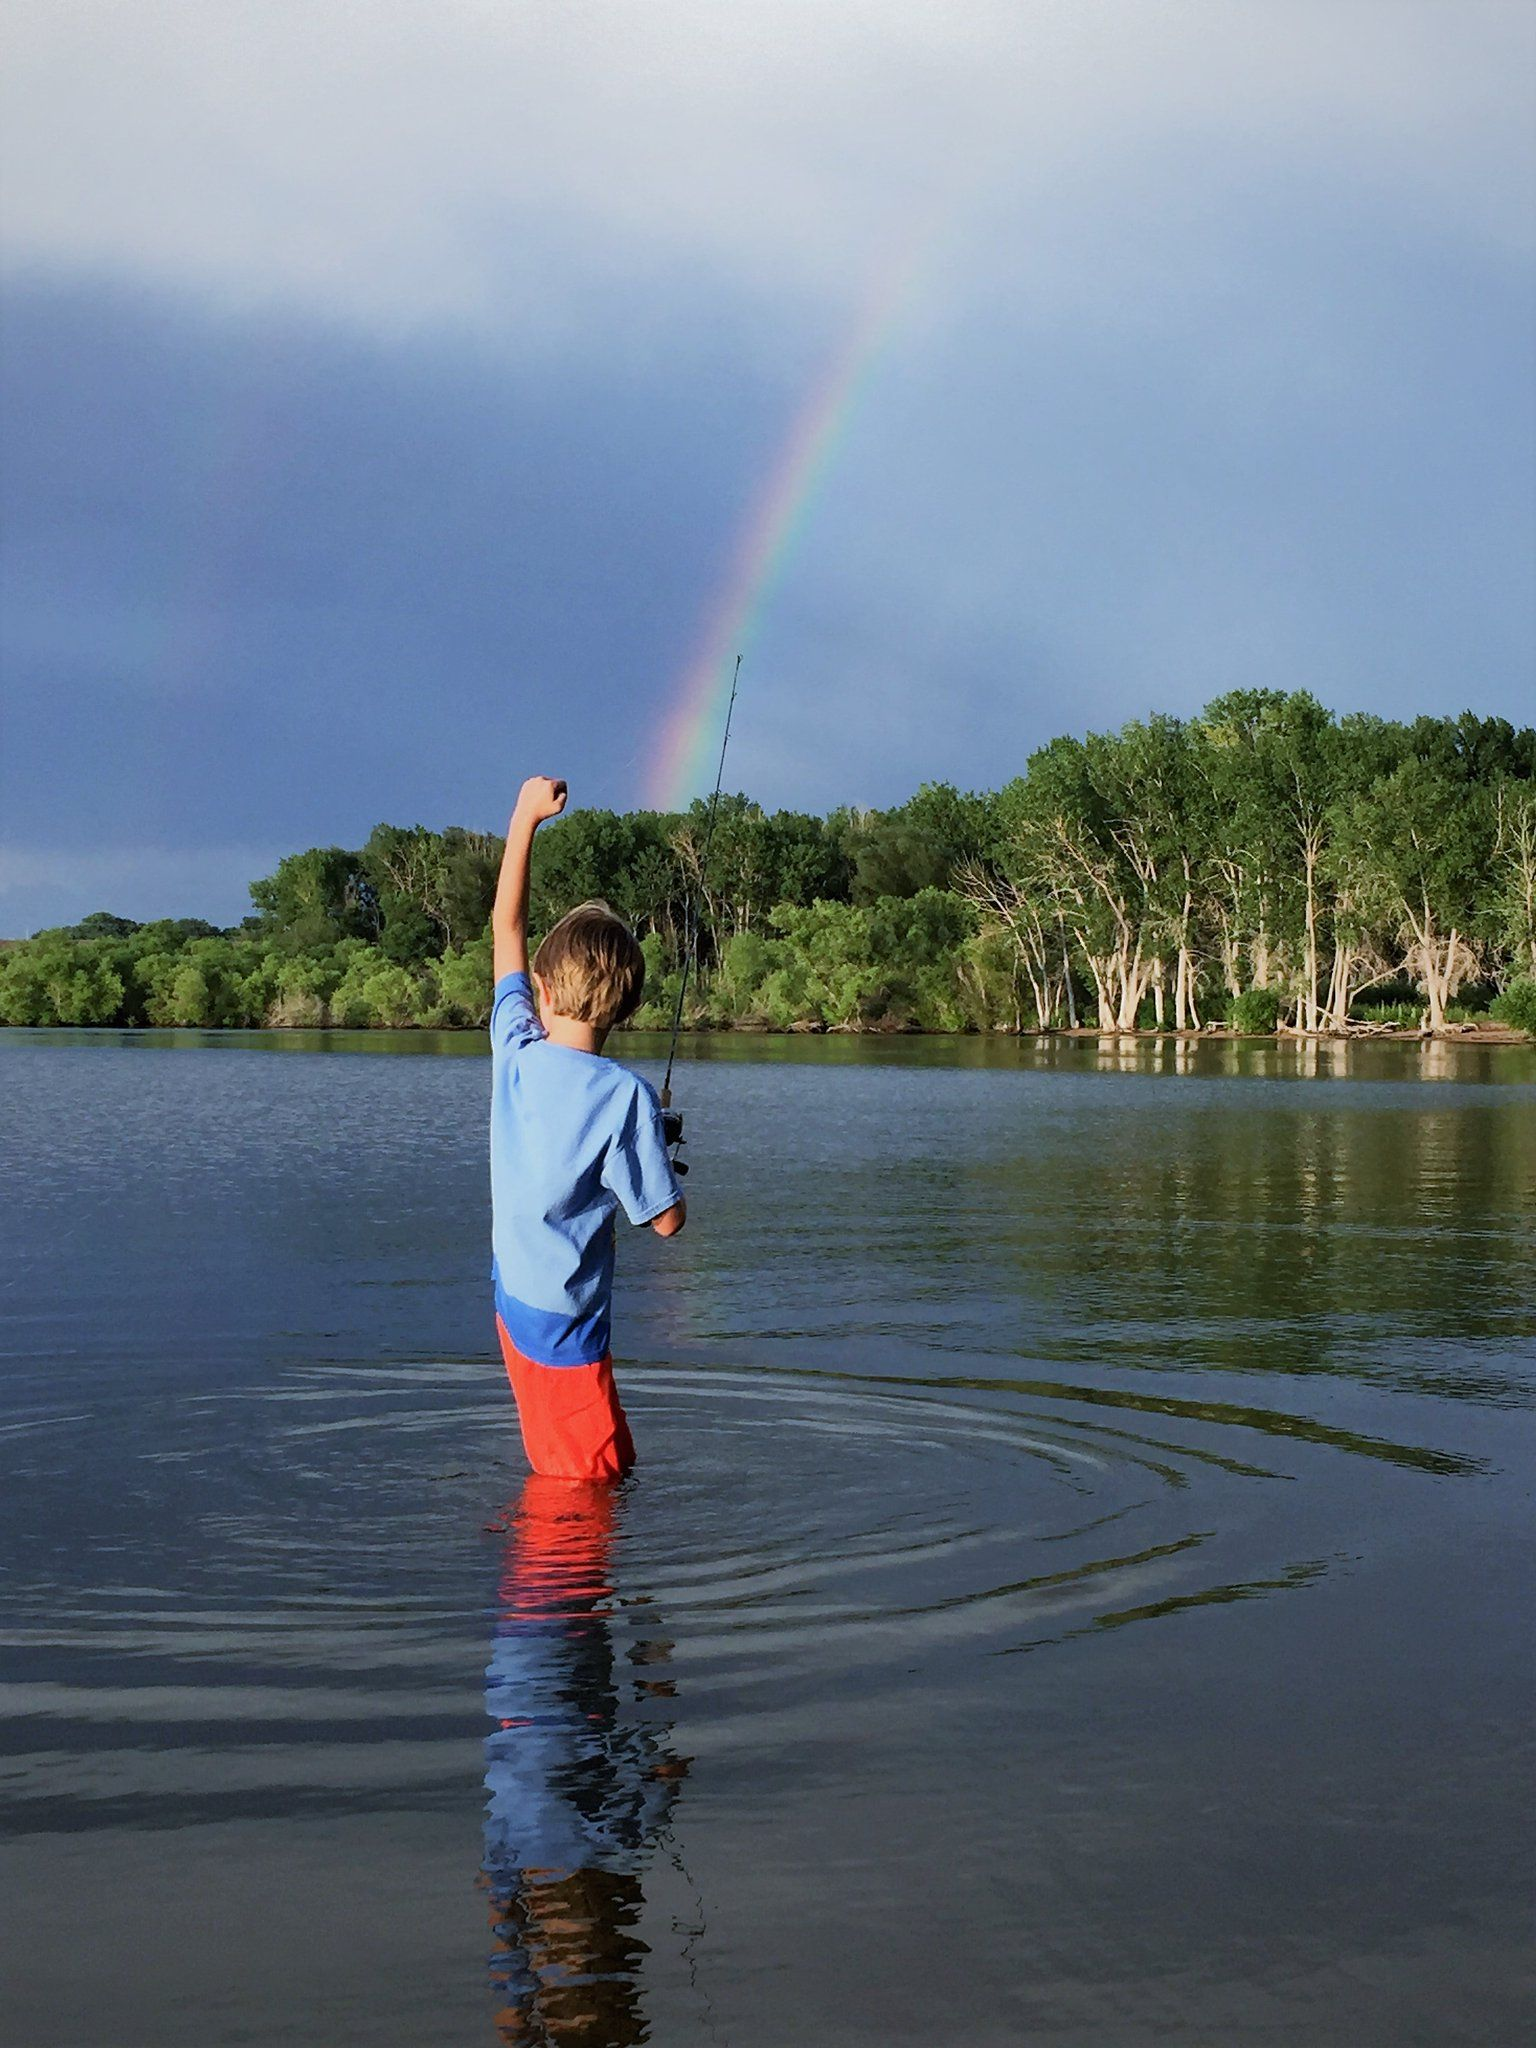 Went fishing under rainbows with my kid last night. I